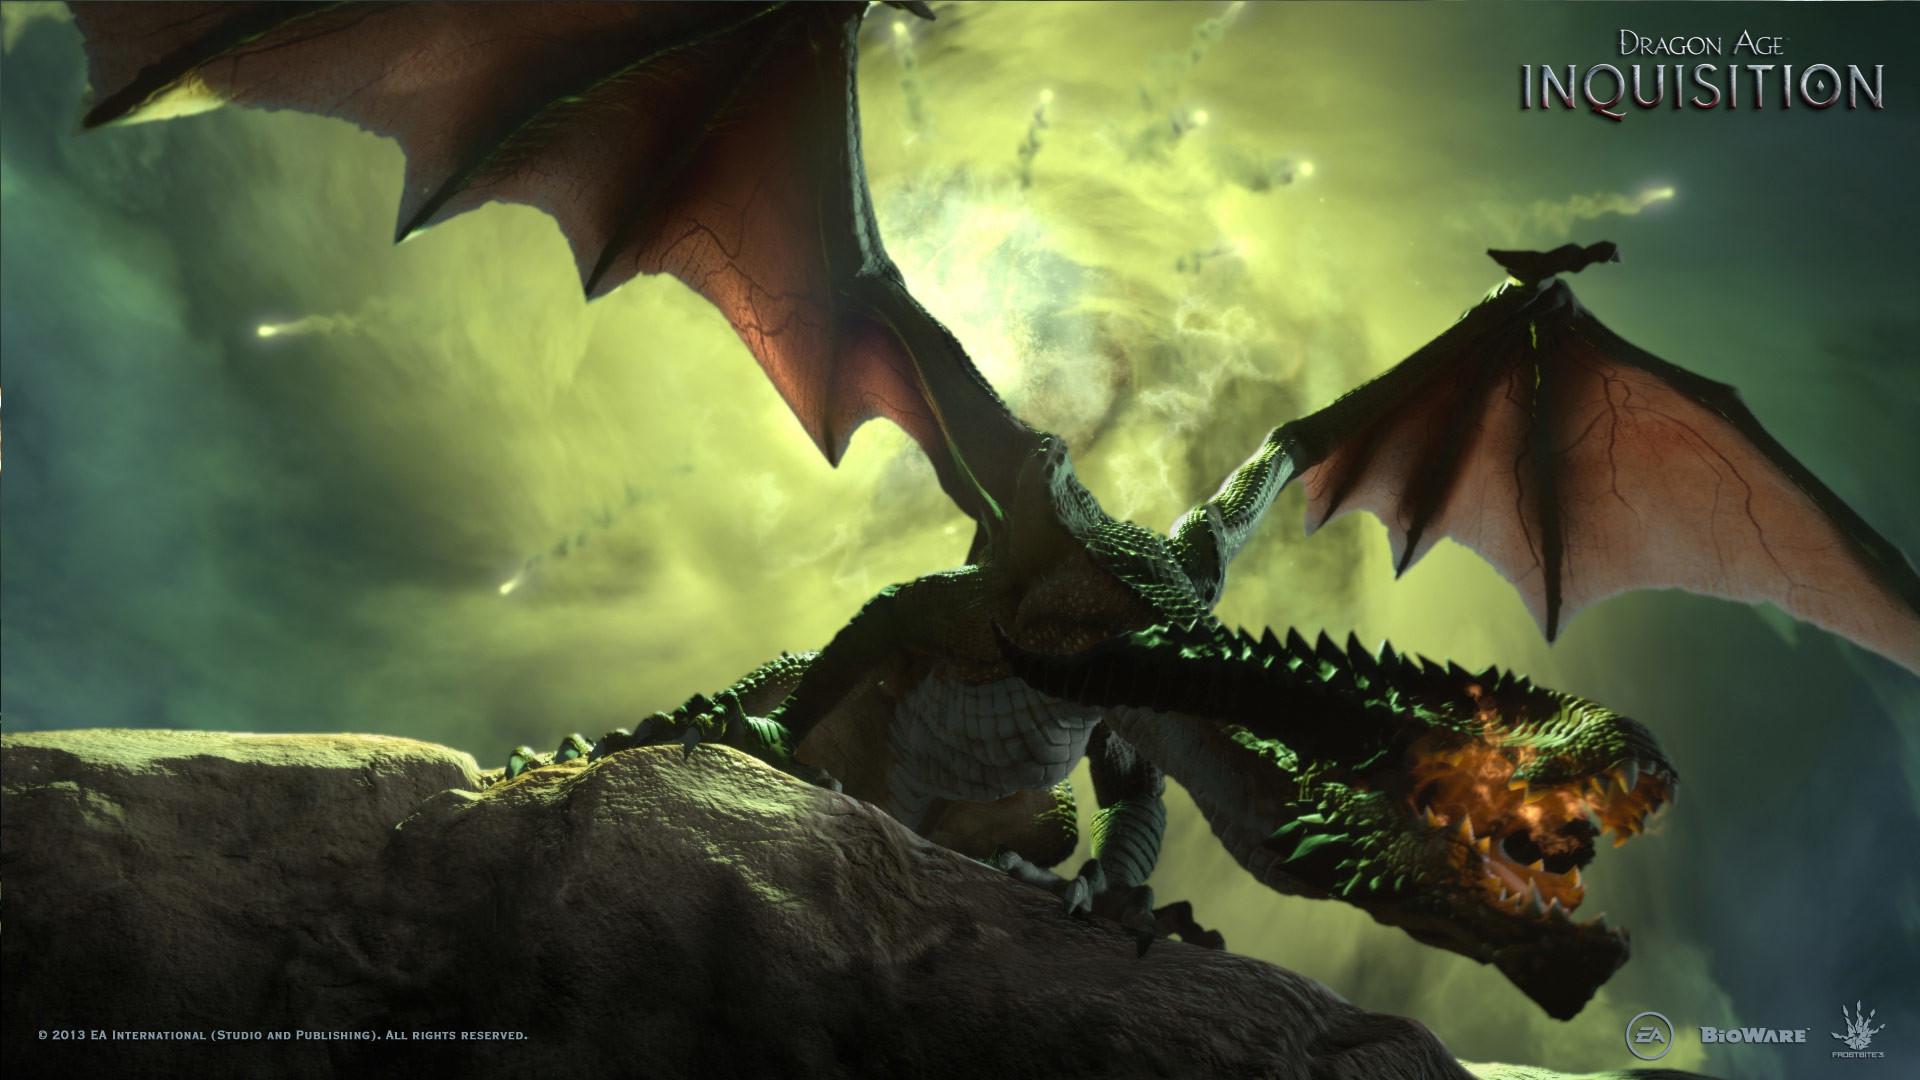 … Dragon Age: Inquisition – Fanart – Background …